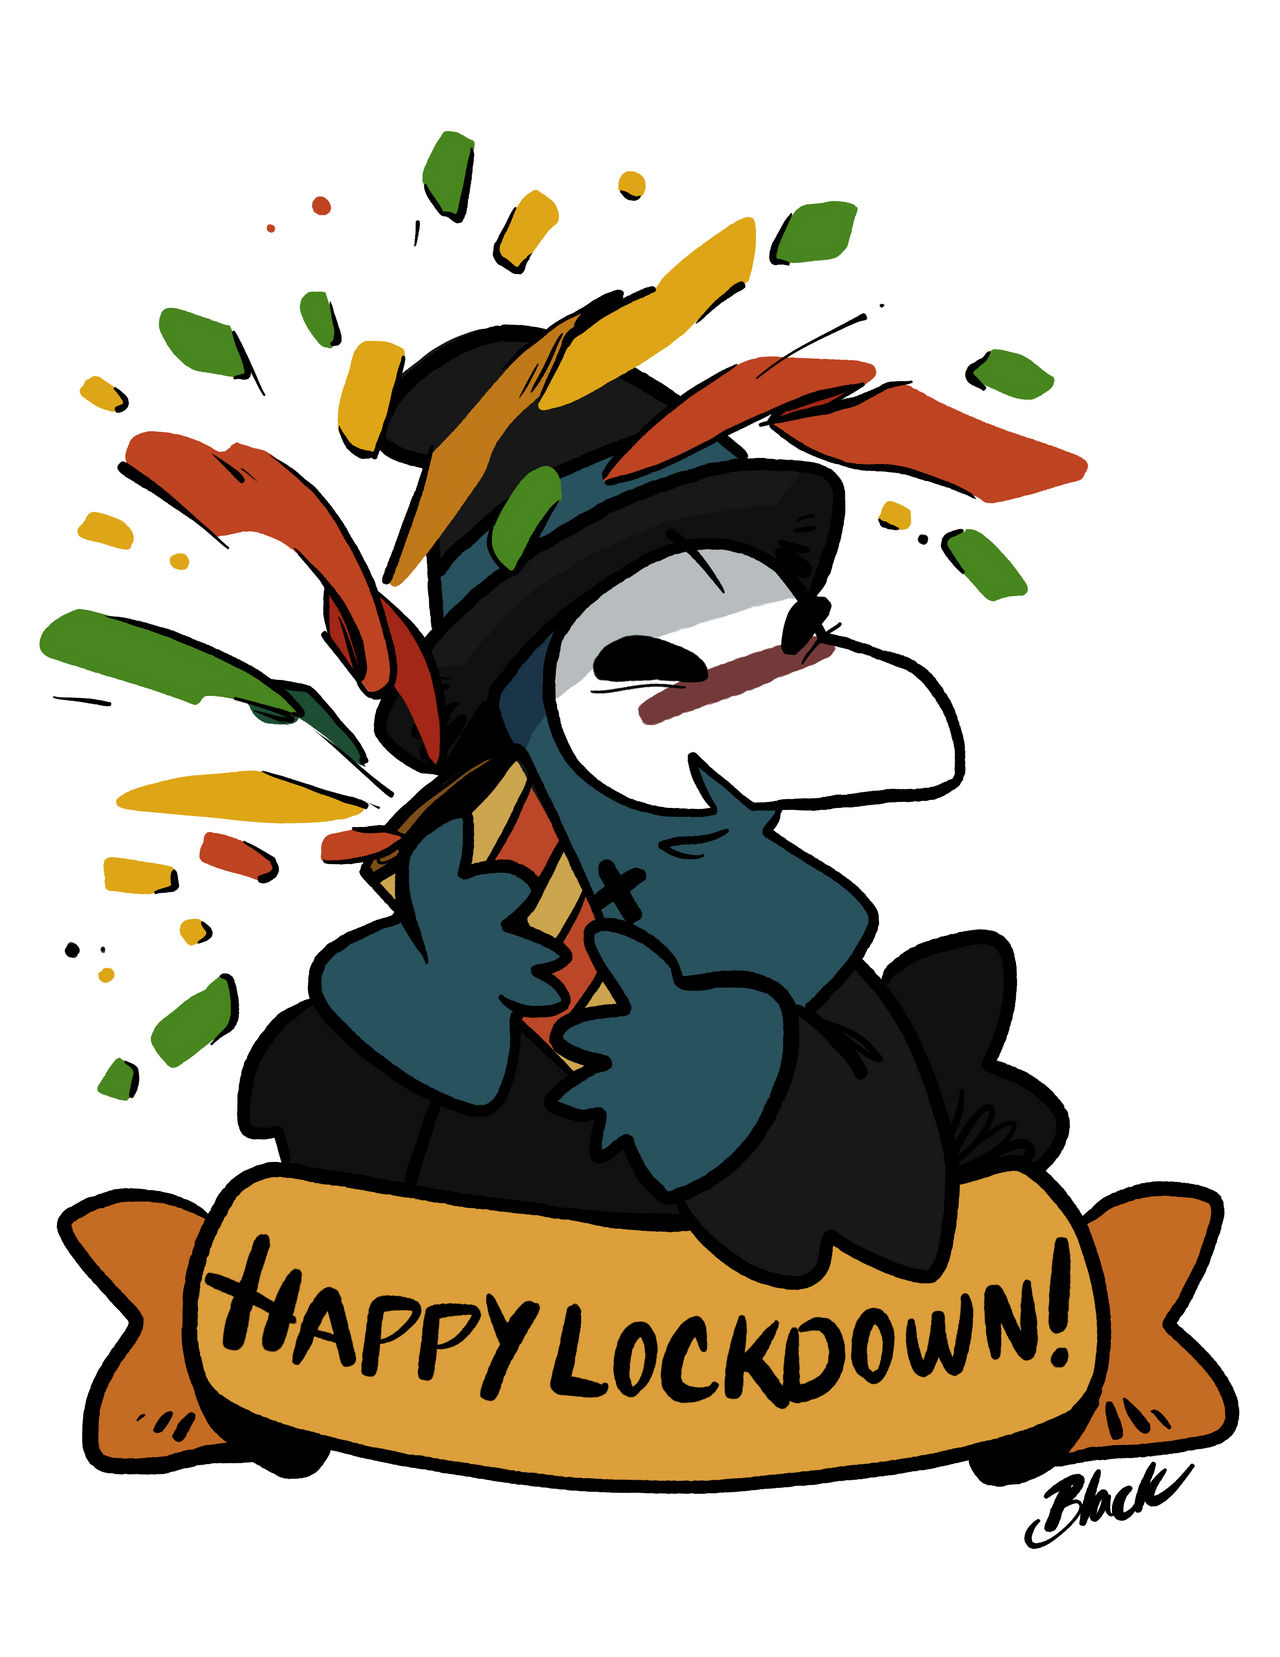 Happy Lockdown